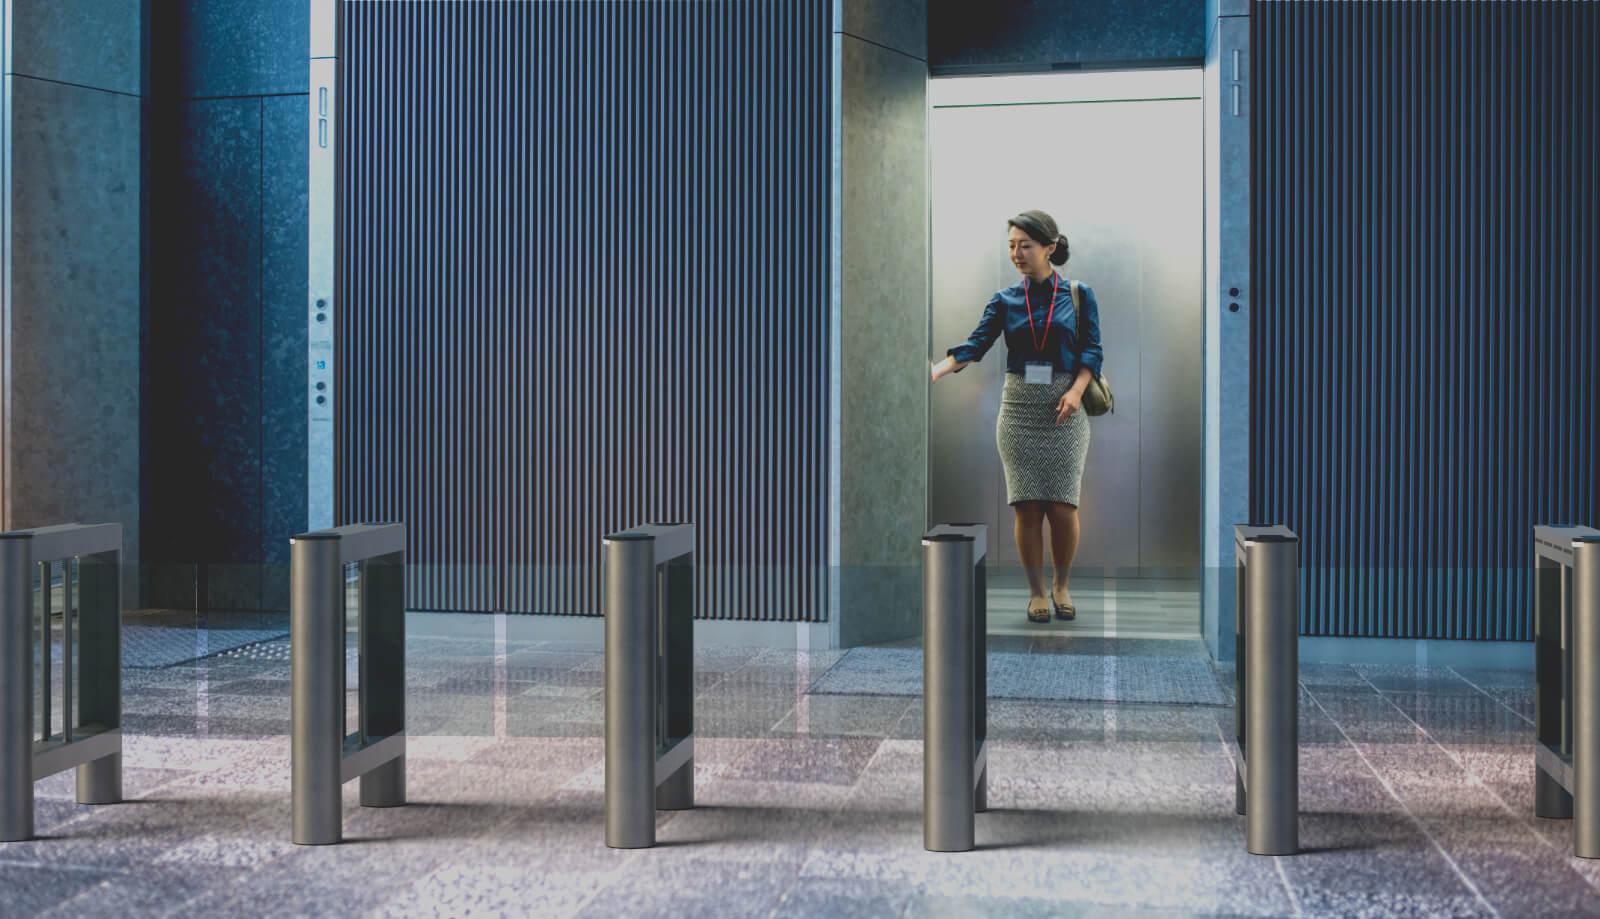 elevator with turnstiles